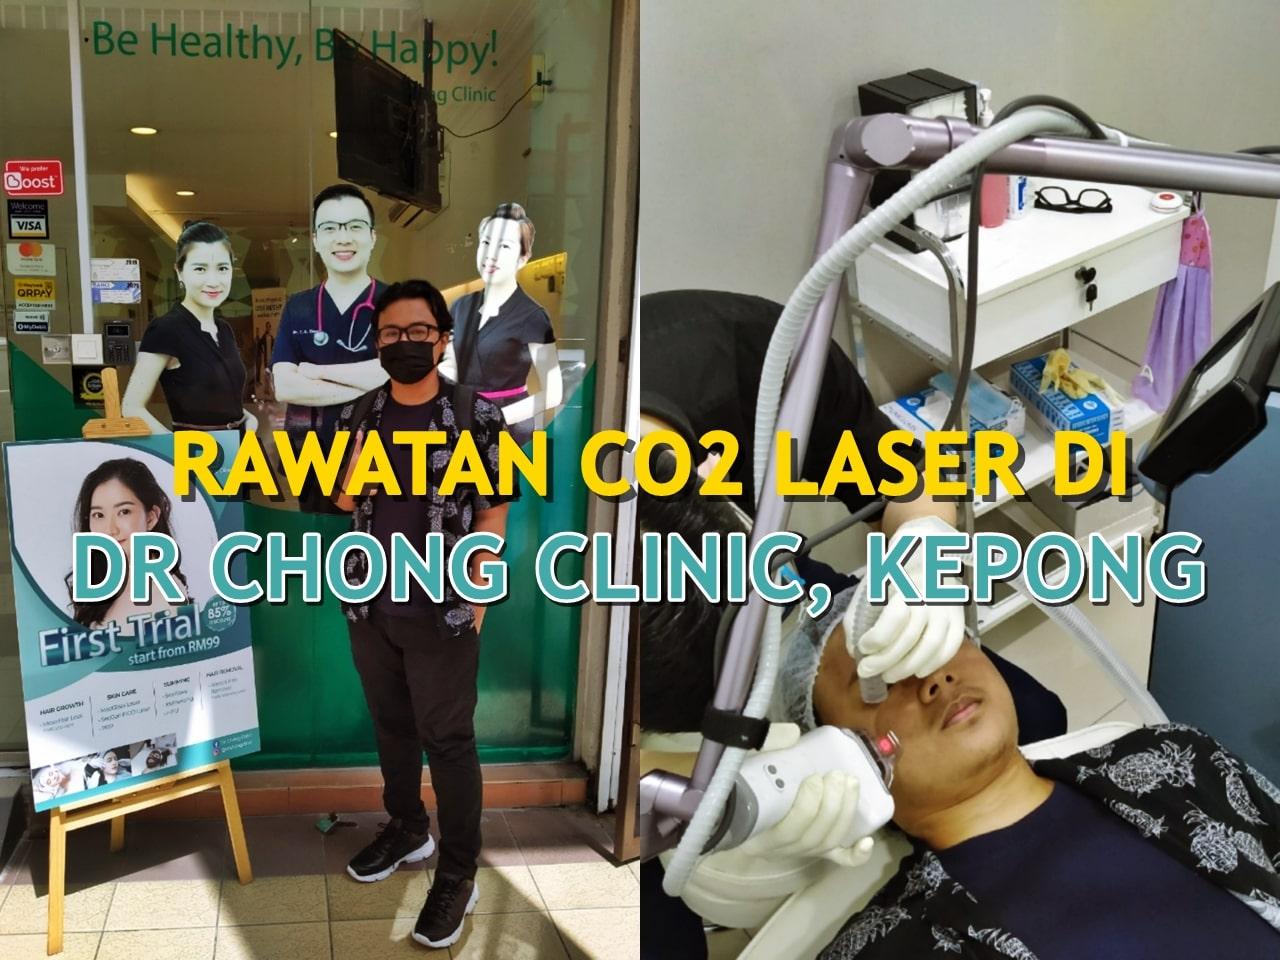 Pengalaman Buat Rawatan Fractional CO2 Laser di Dr Chong Clinic Kepong